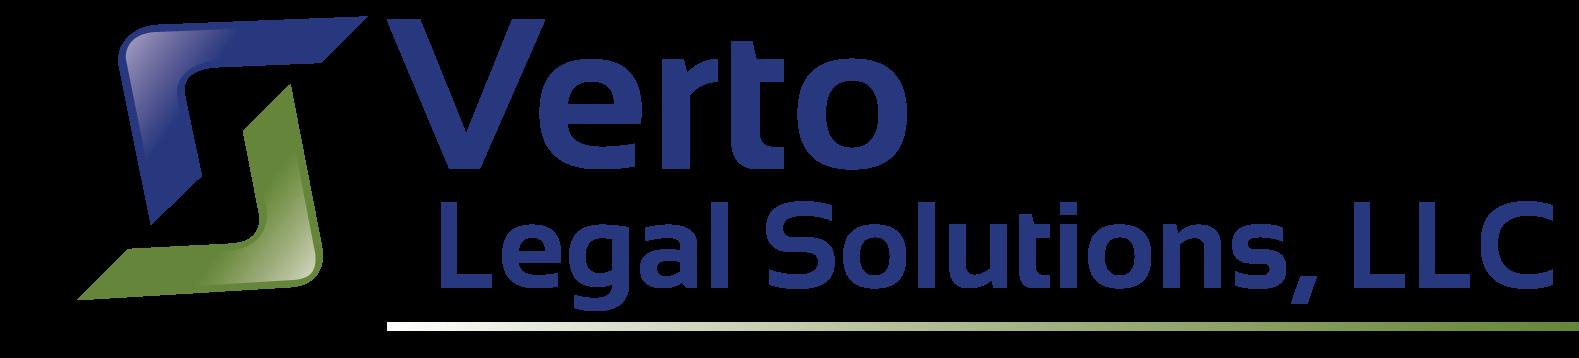 Verto Legal Solutions